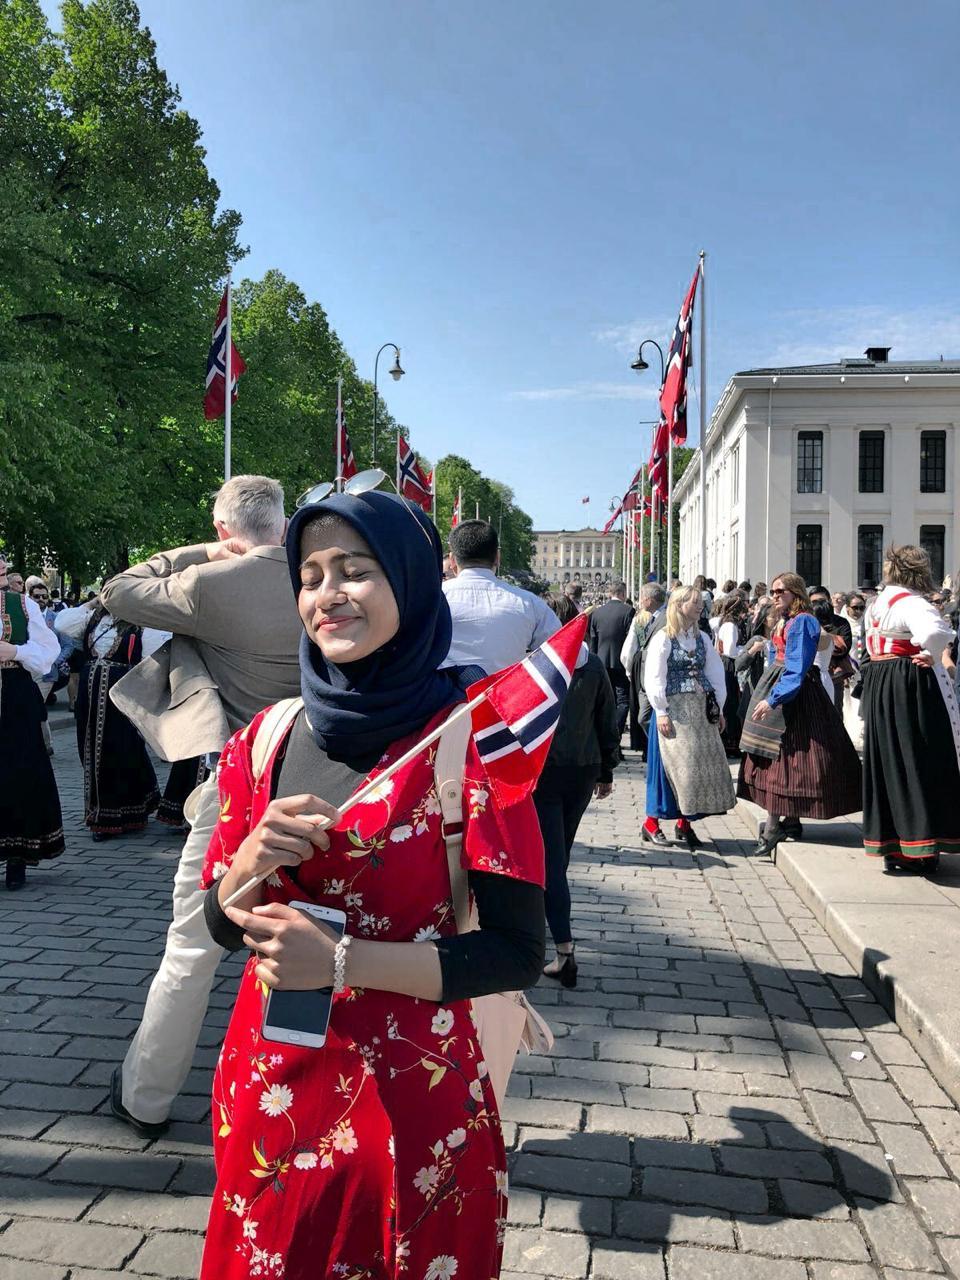 Nadhill berpose di depan Royal Palace memperingati Norway Constitution Day Parade